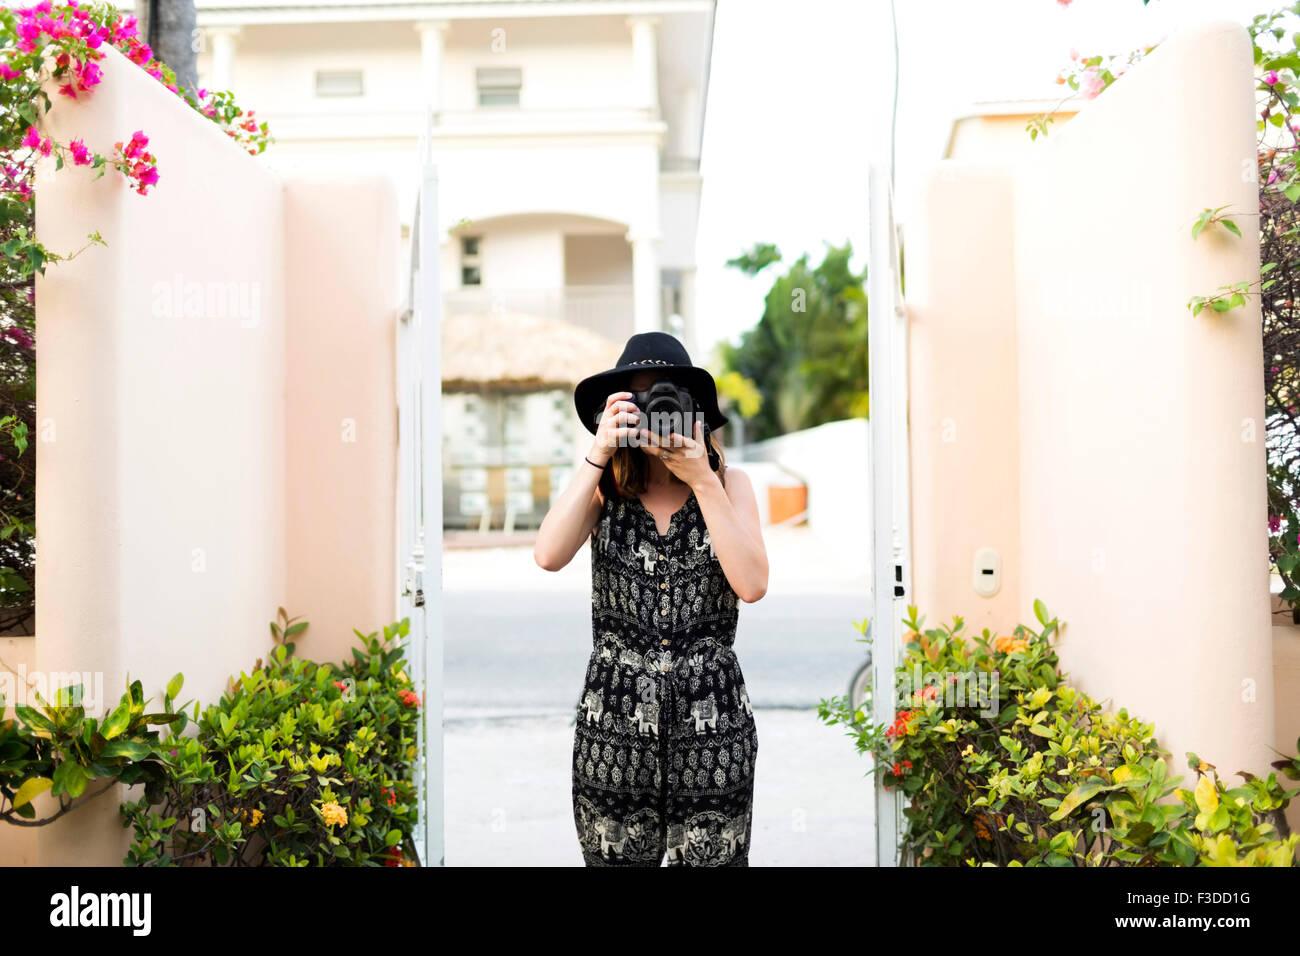 Frau fotografieren während der Ferien Stockbild